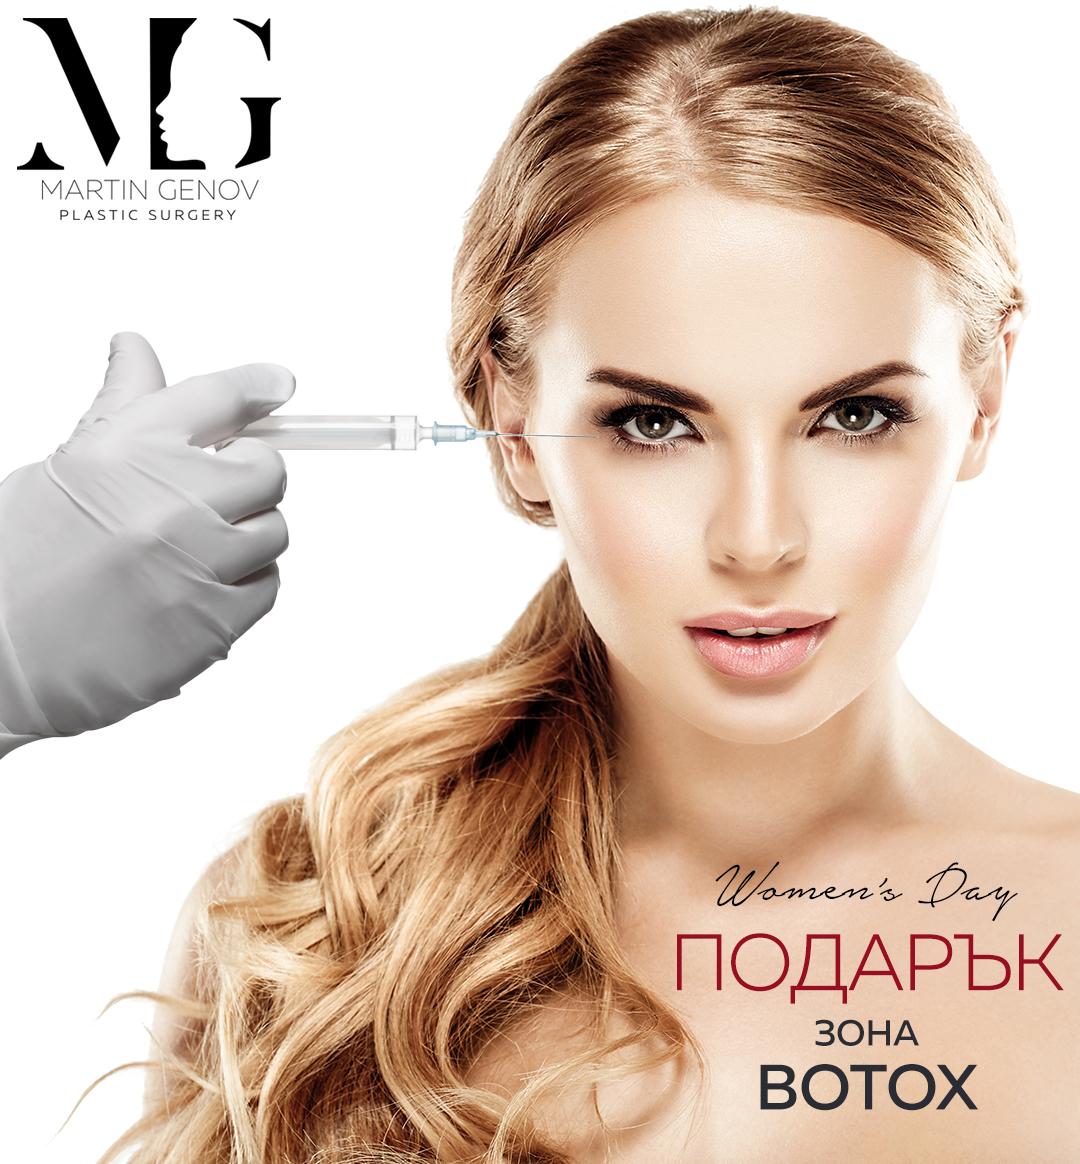 Botox подарък 8 март